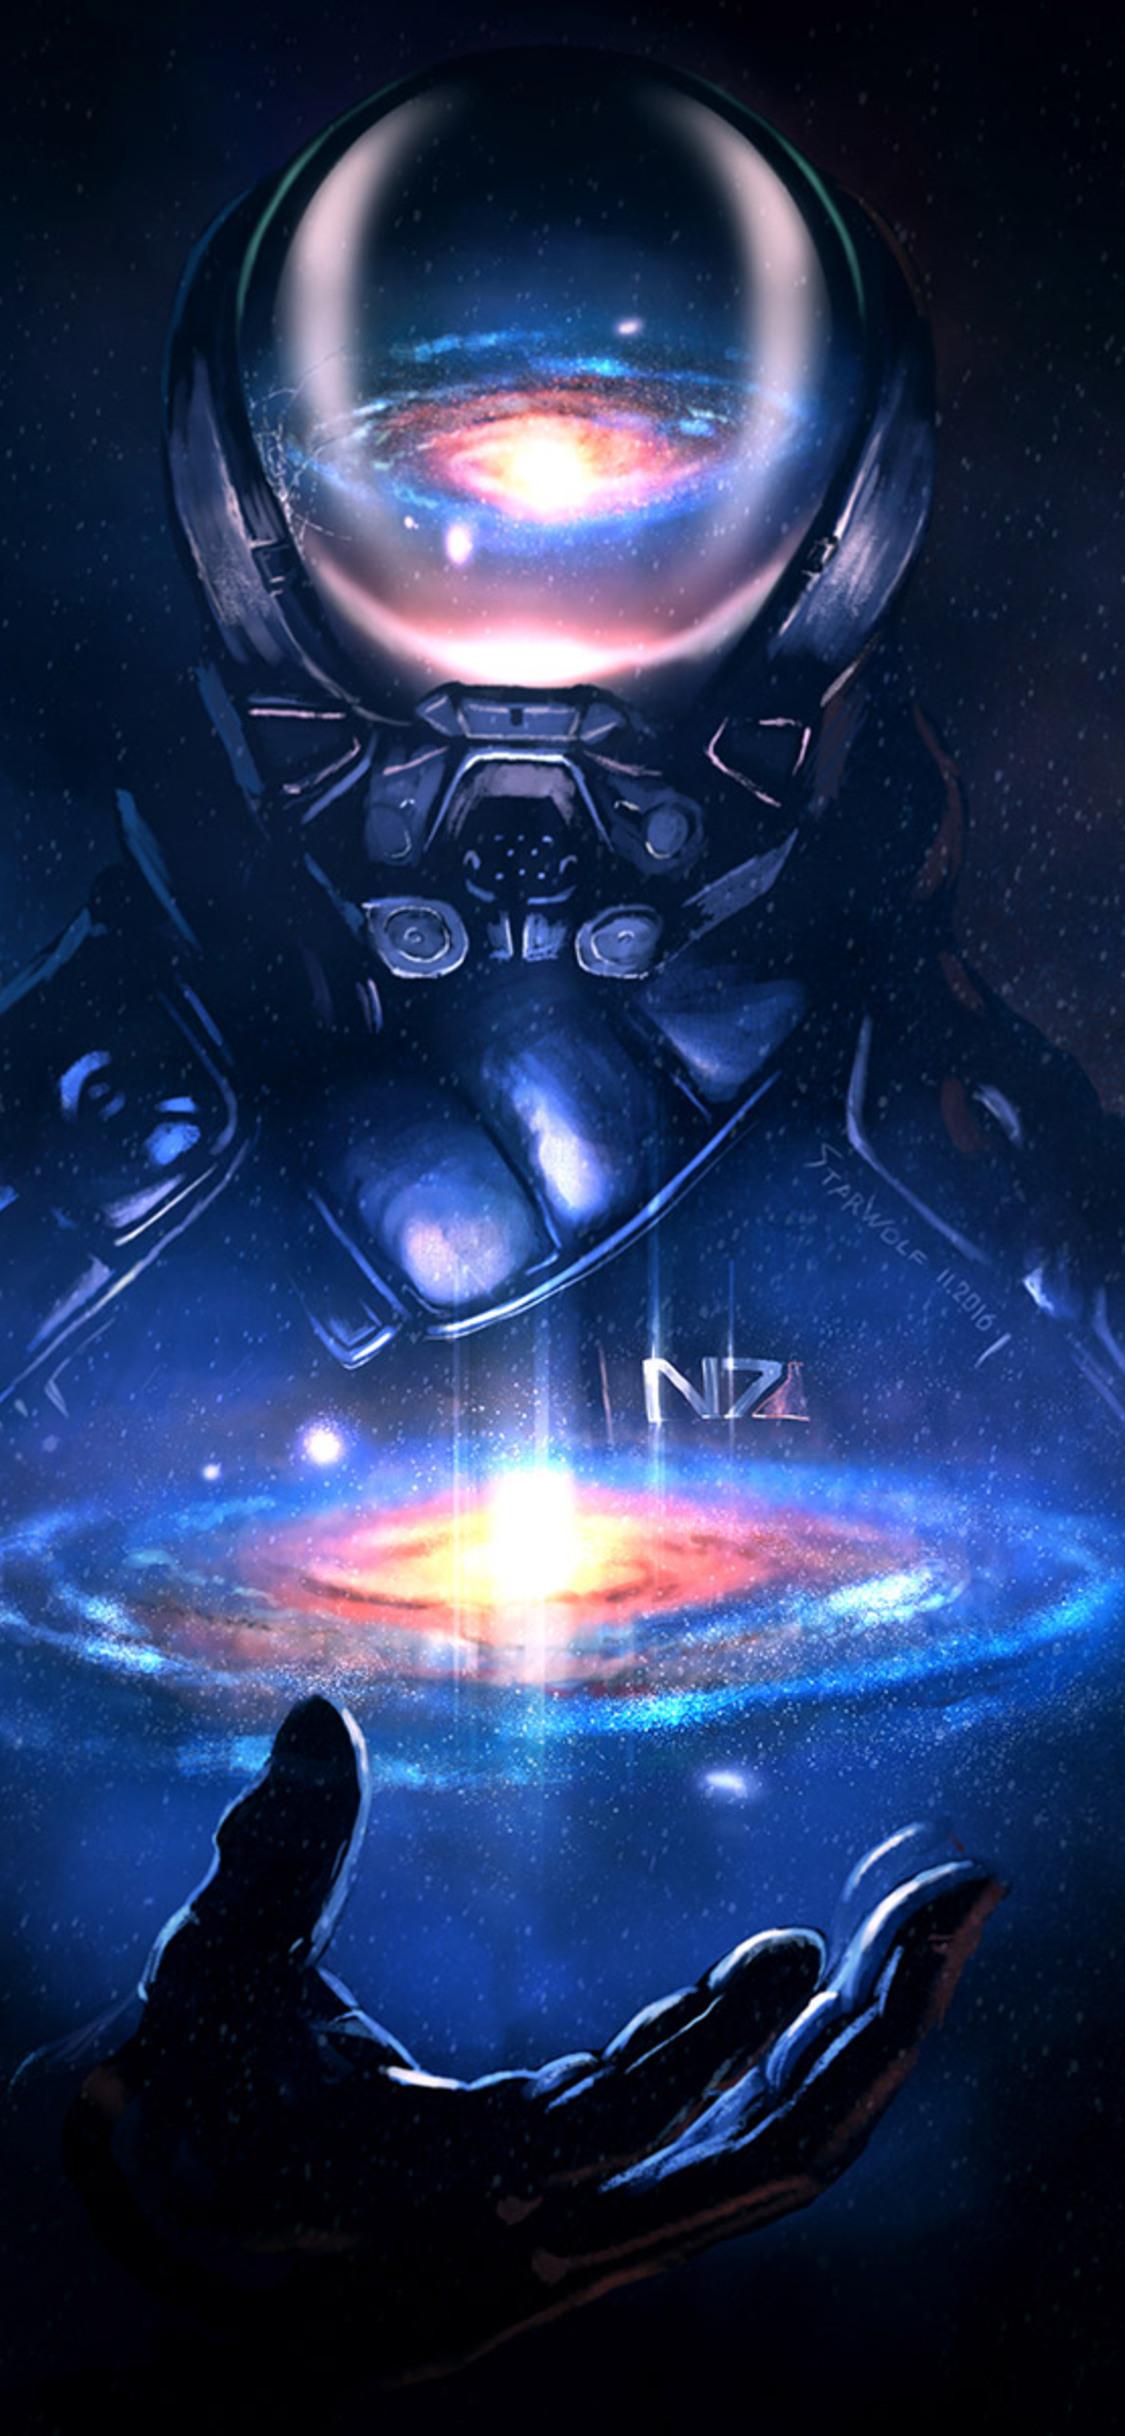 1125x2436 Mass Effect Andromeda Artwork Iphone Xs Iphone 10